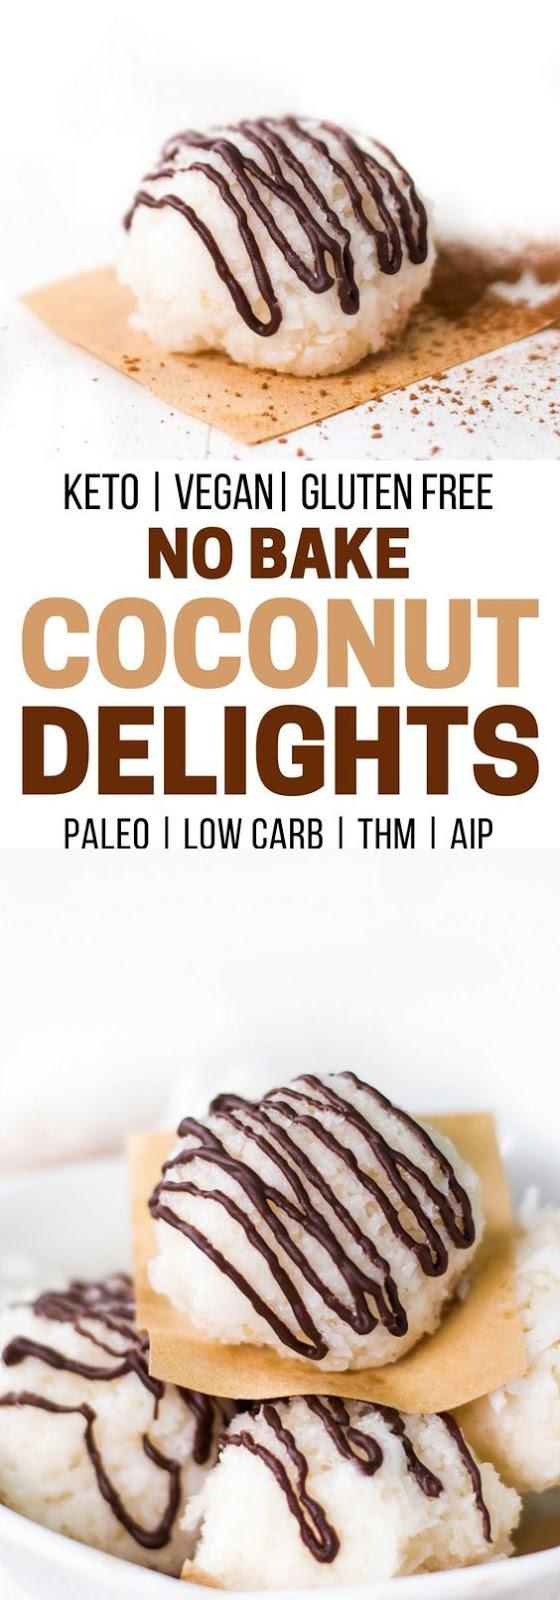 No Bake Coconut Cookies  Coconut Delights – paleo, vegan, low carb, keto, AIP